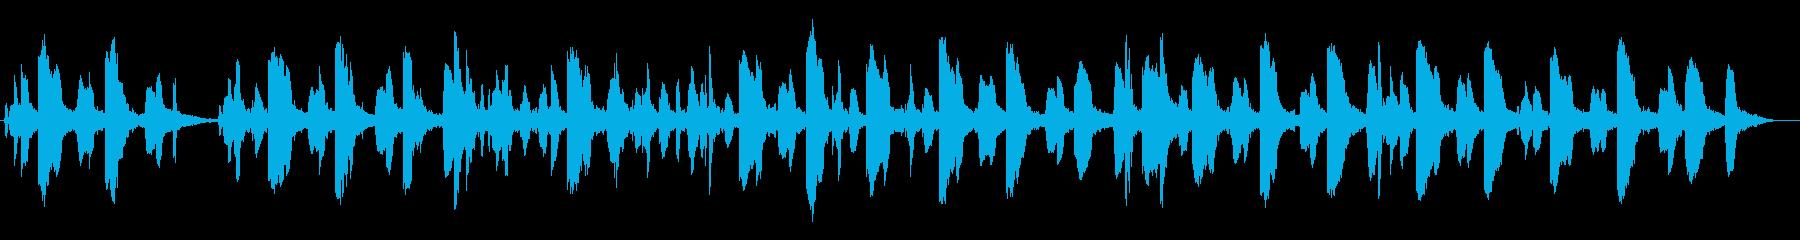 KANT近未来ロボット言語効果音2の再生済みの波形